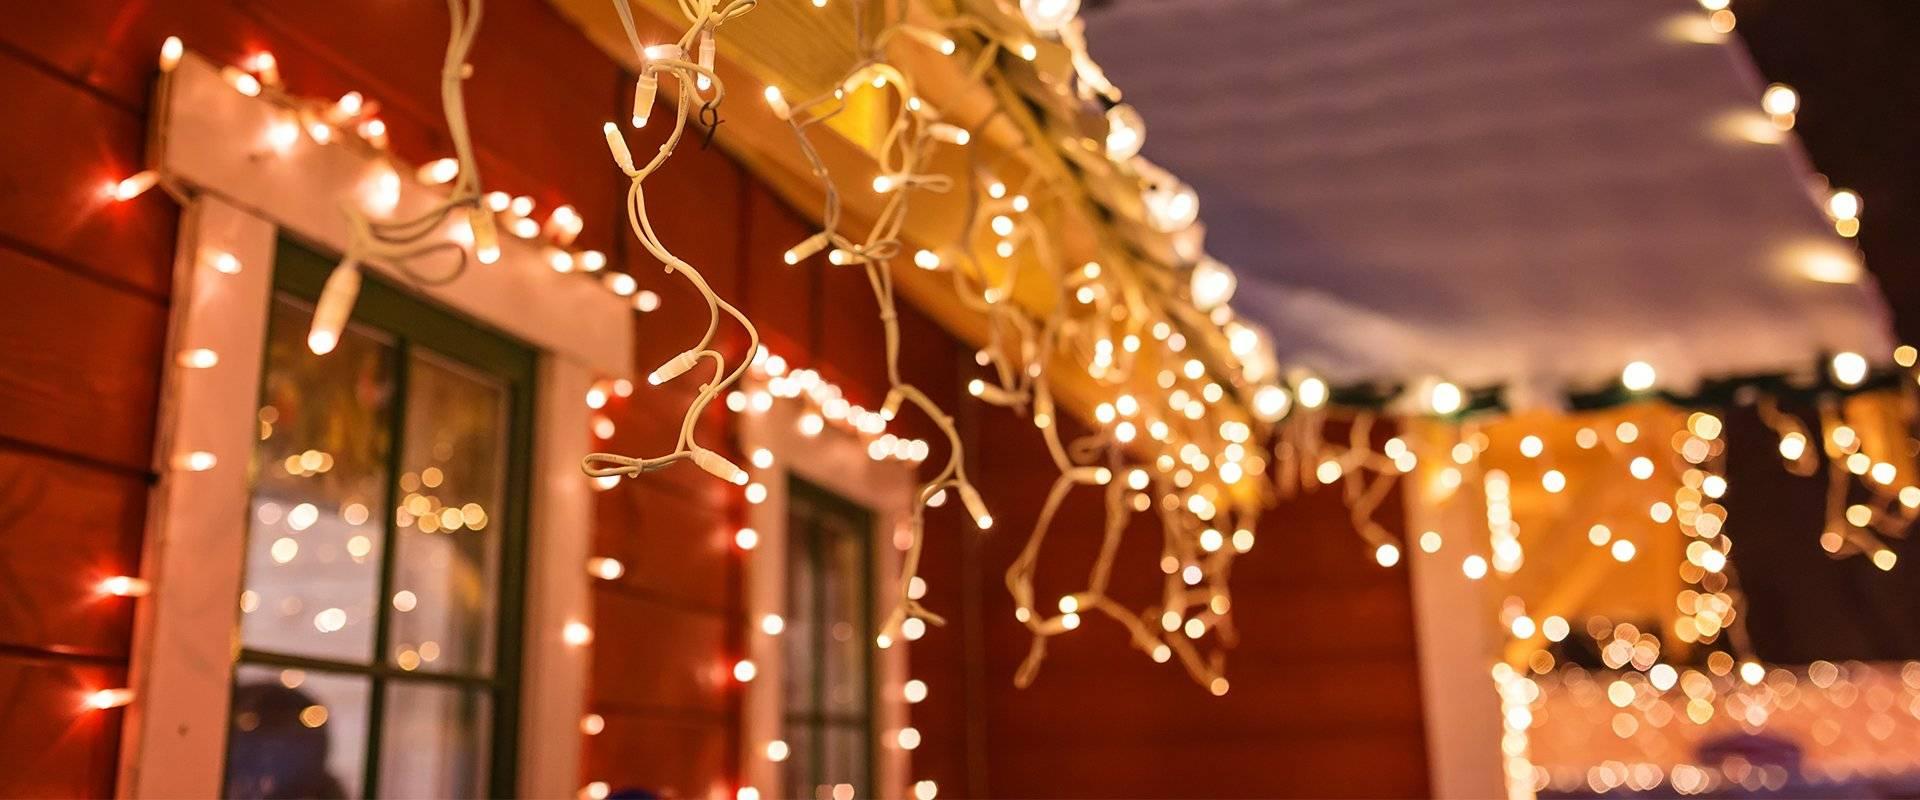 christmas lights on a roof